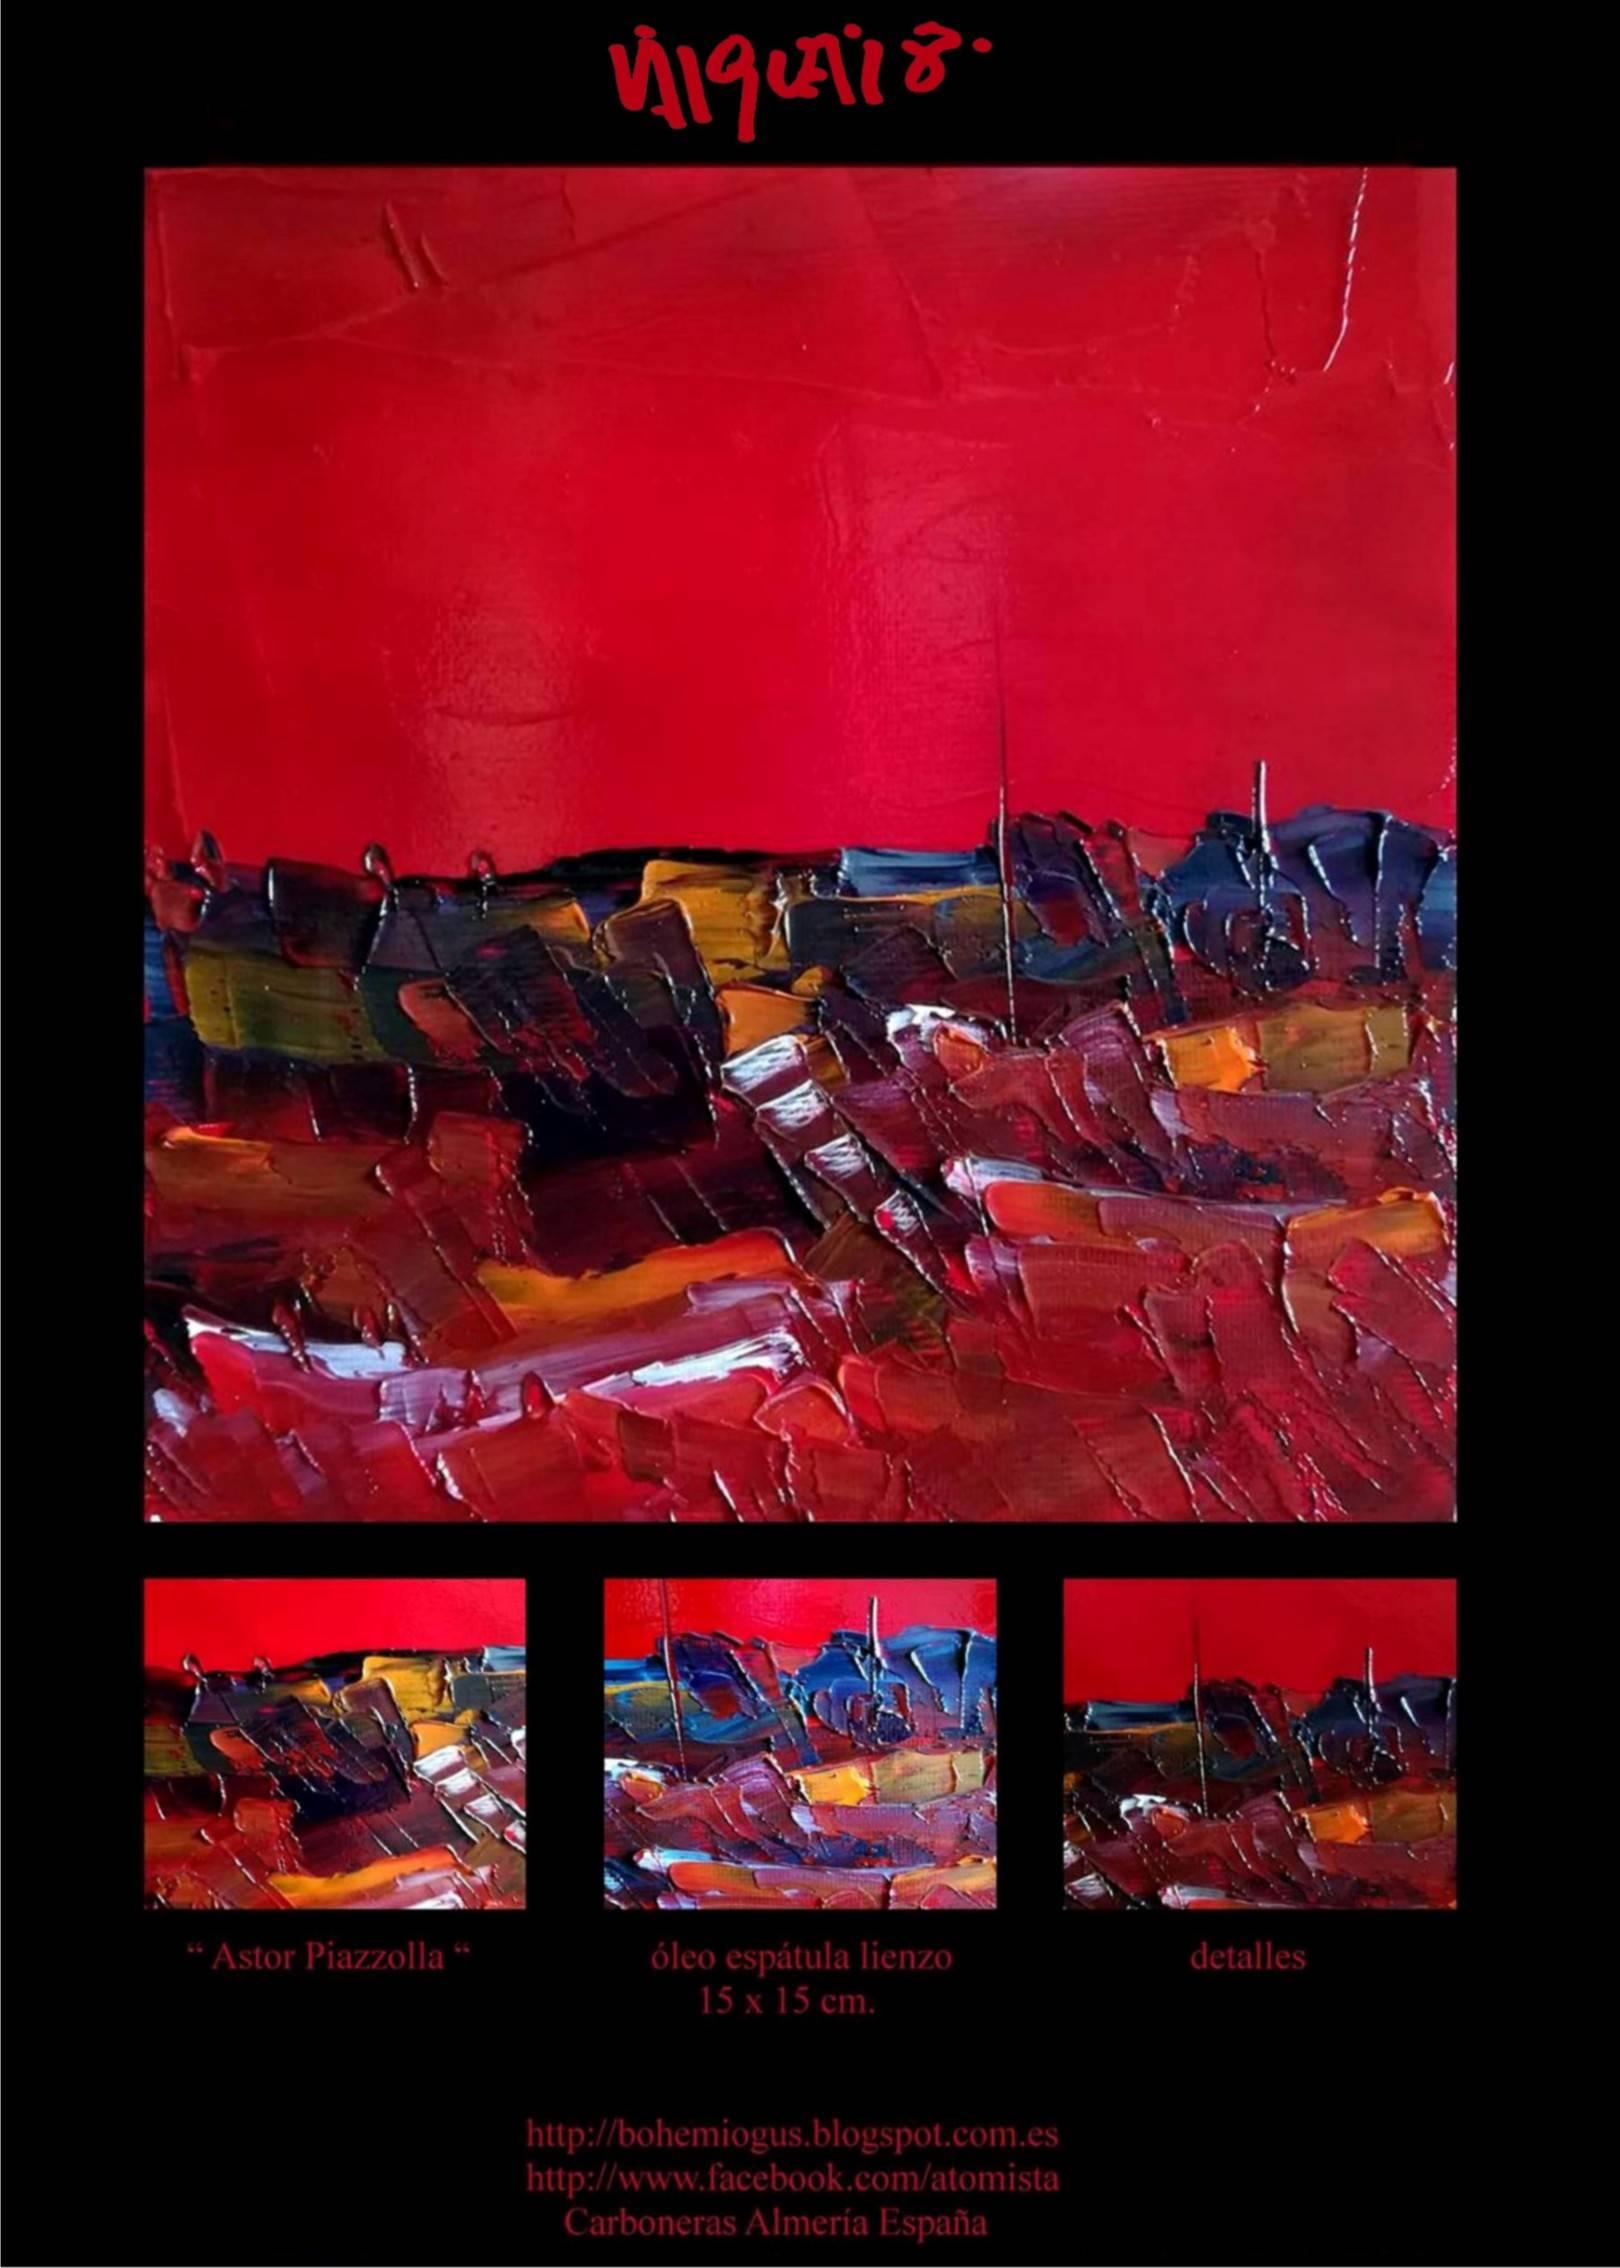 Astor Piazzolla. 2018 óleo espátula lienzo 15 x 15 cm. http://bohemiogus.blogspot.com